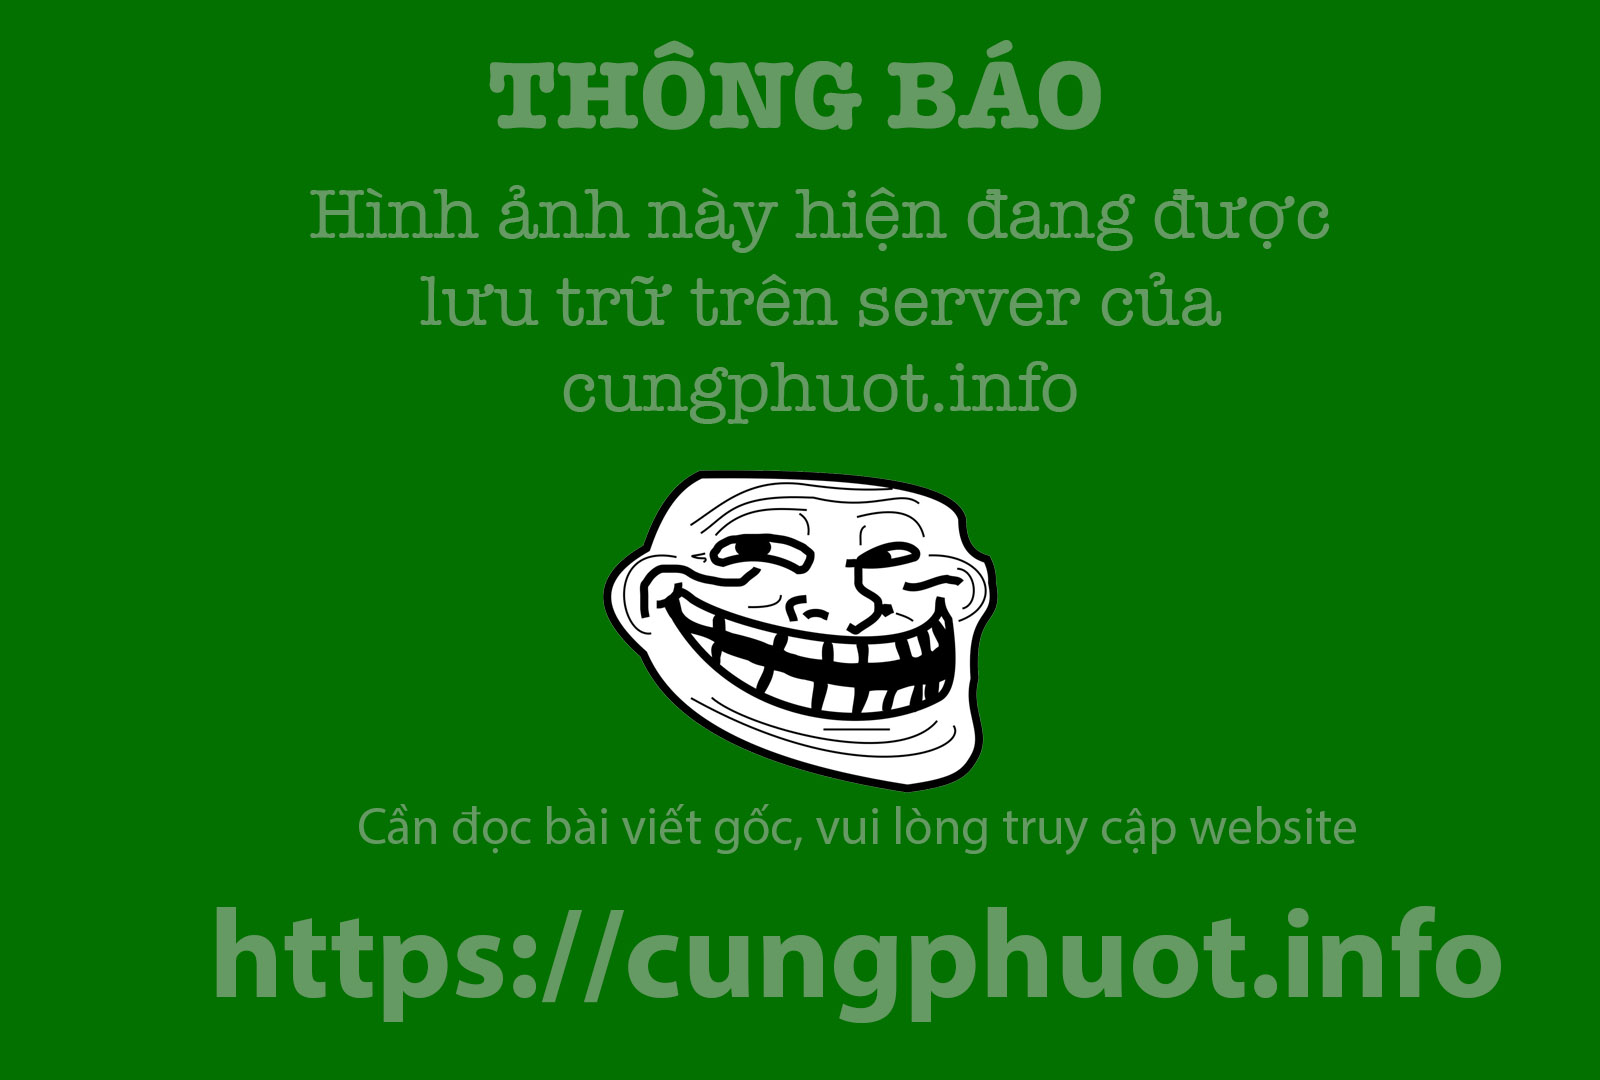 Buses to Quang Binh